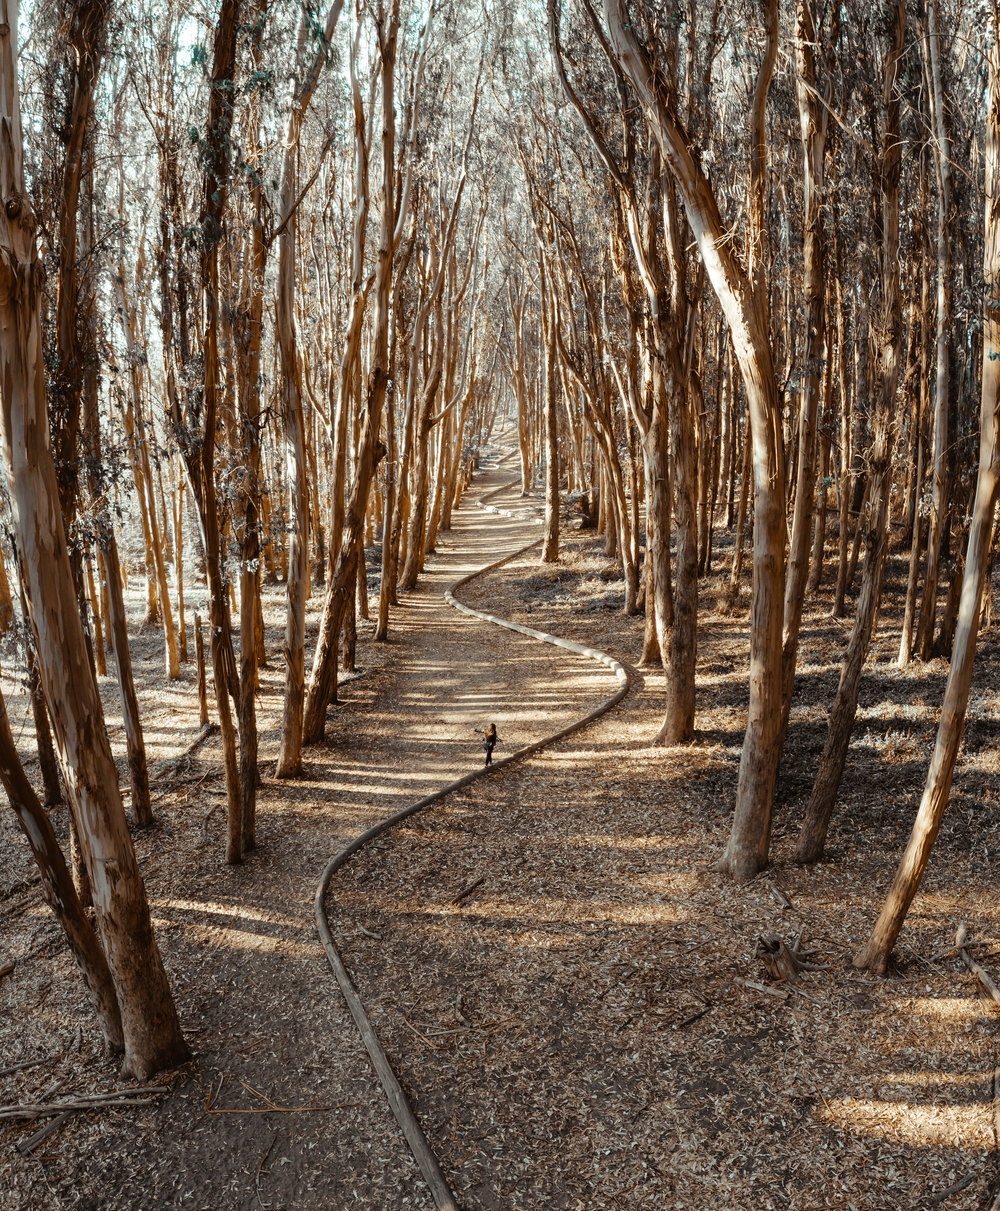 presidio-woodline-edits-1.jpg